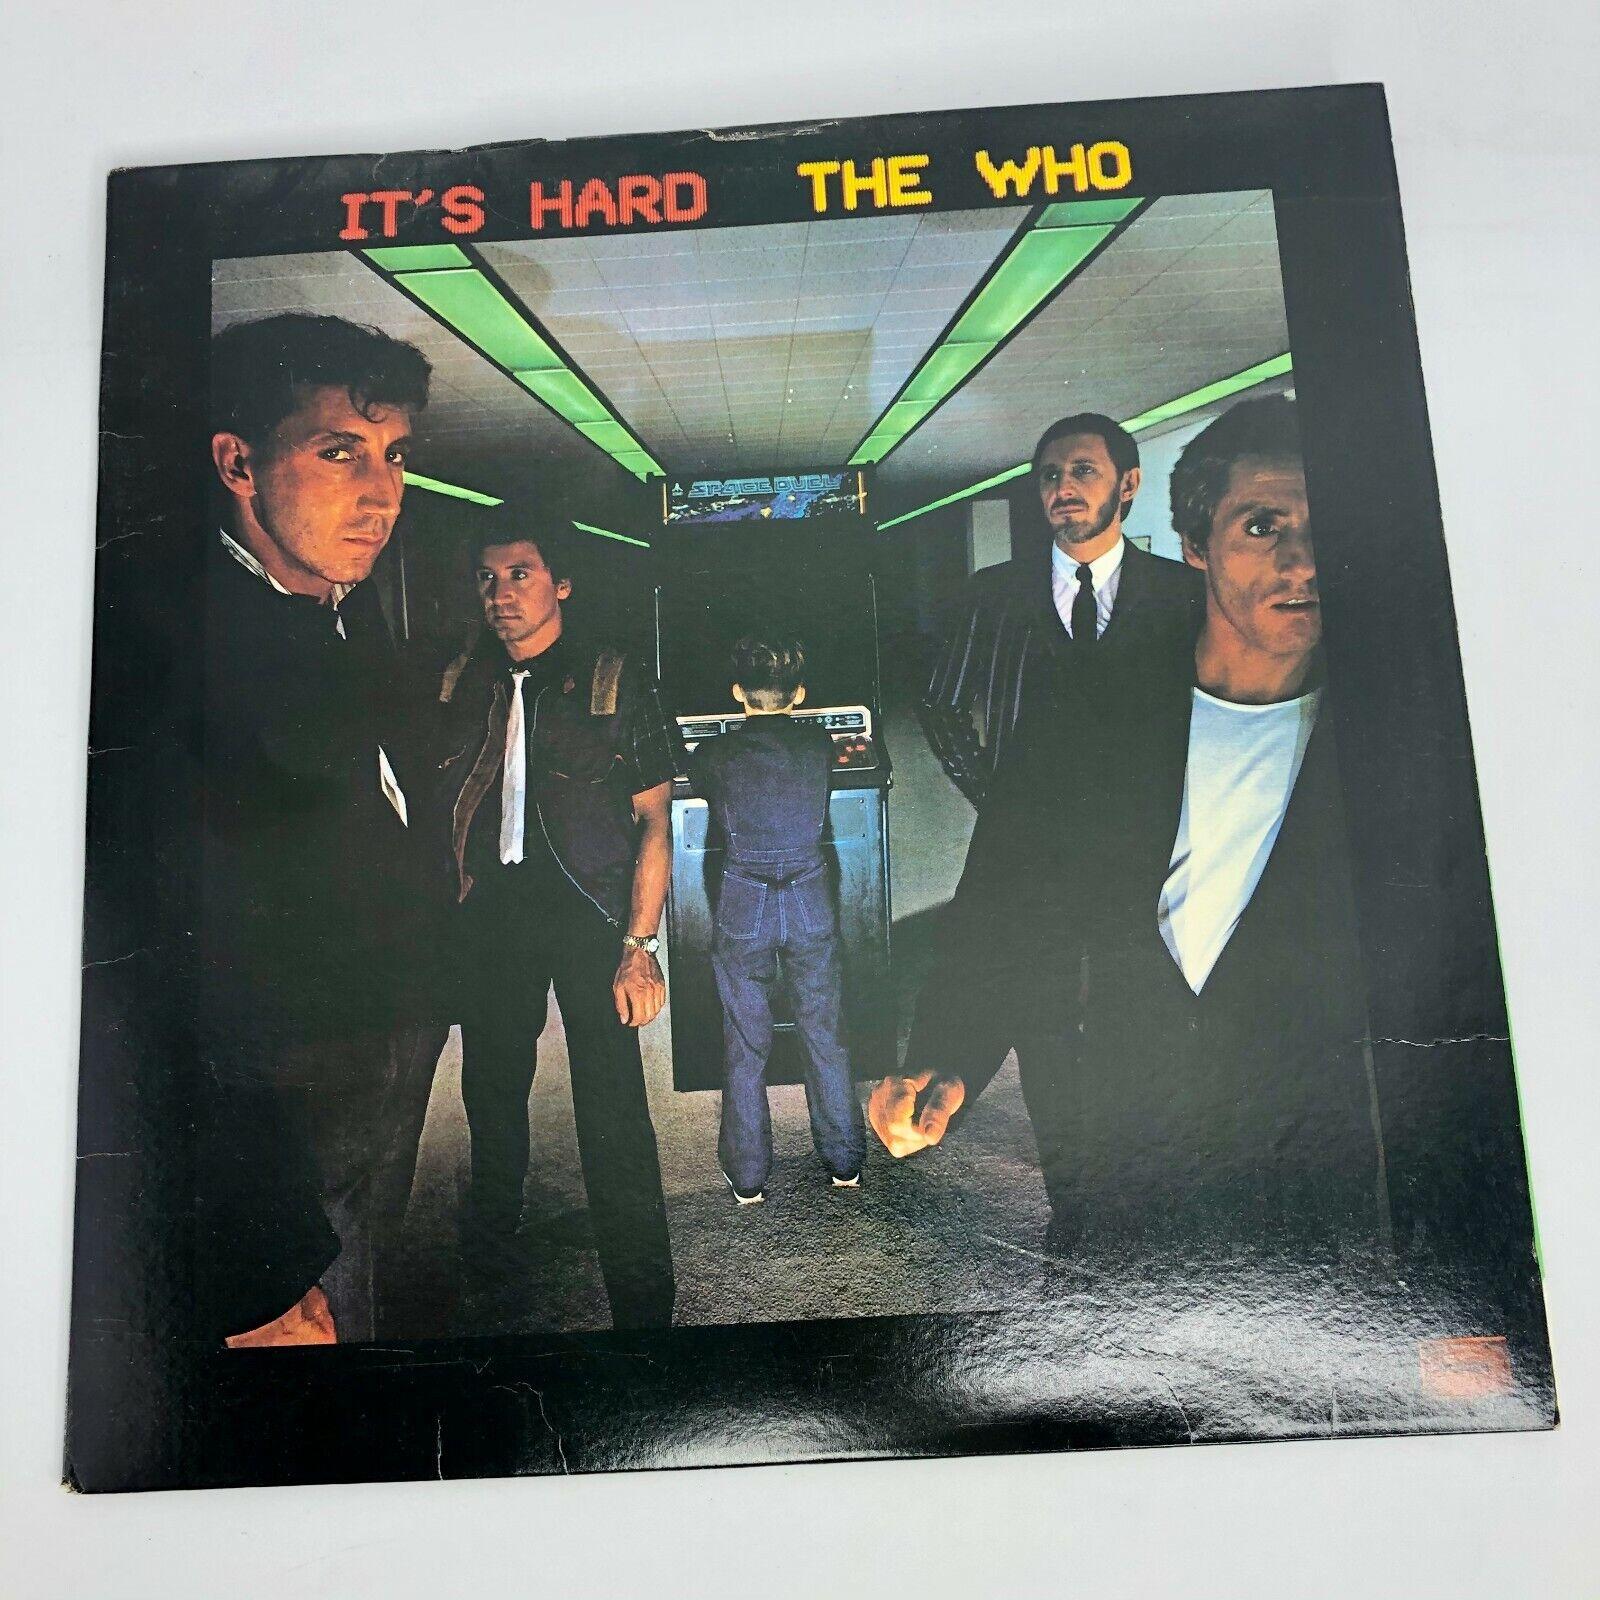 The Who - It s Hard LP 1982 - Warner Bros Vinyl LP Album 1-23731 Record  - $5.99